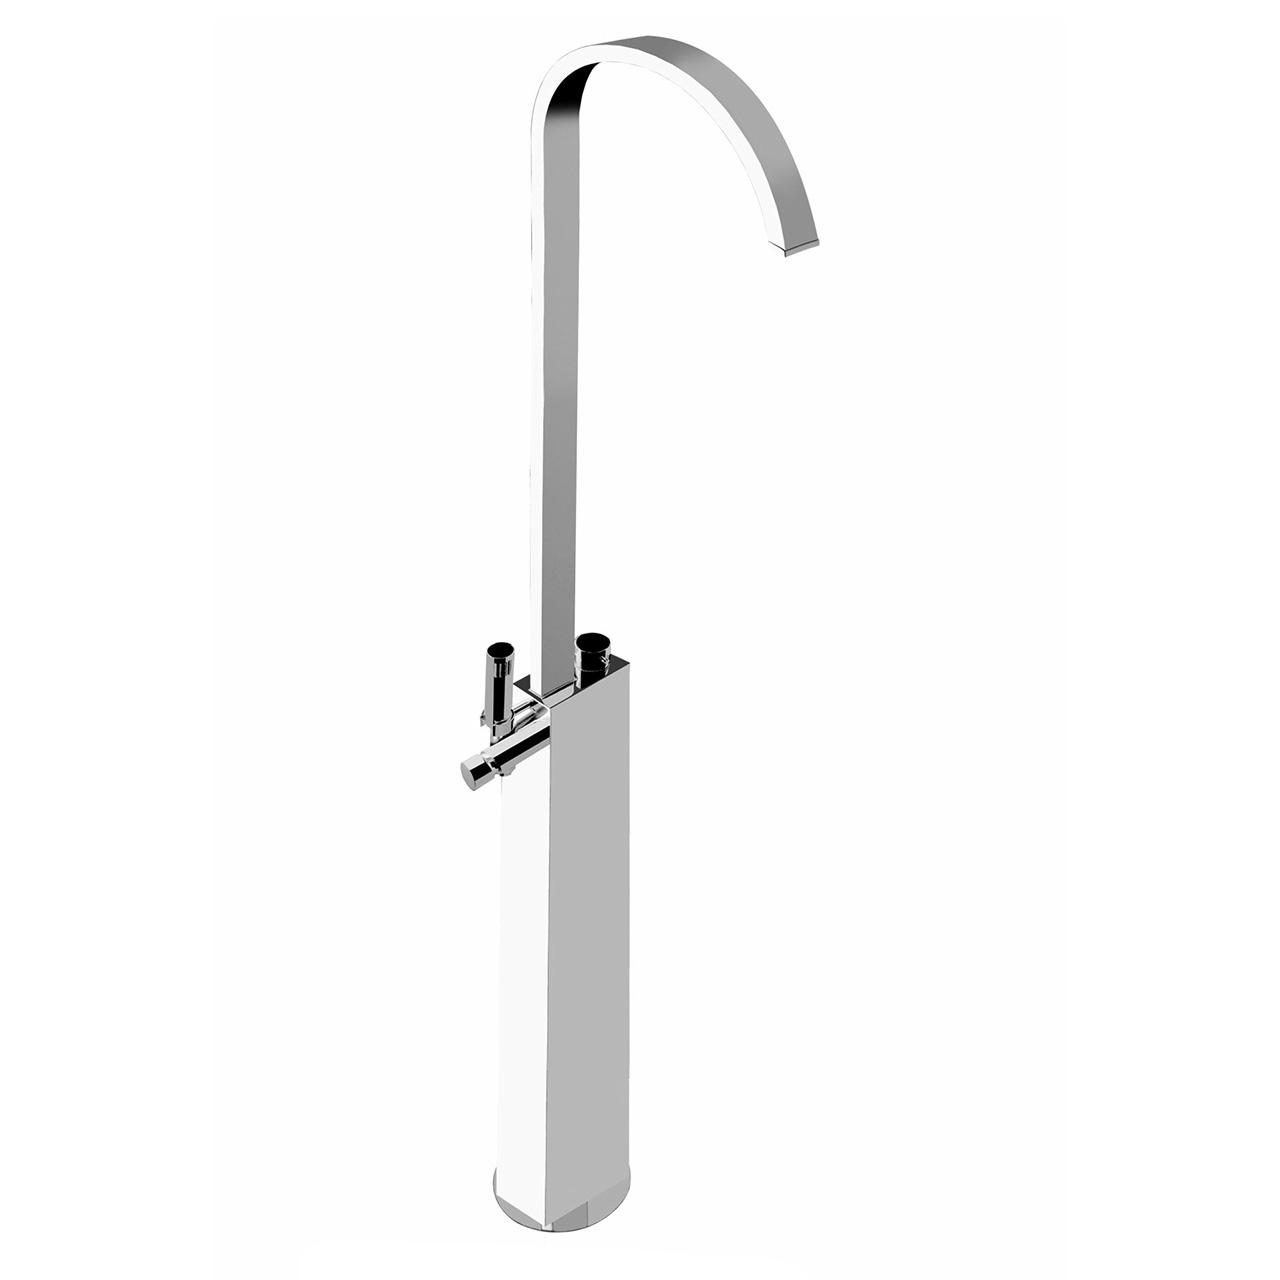 Bonomi Arco Floor Mounted Shower Column